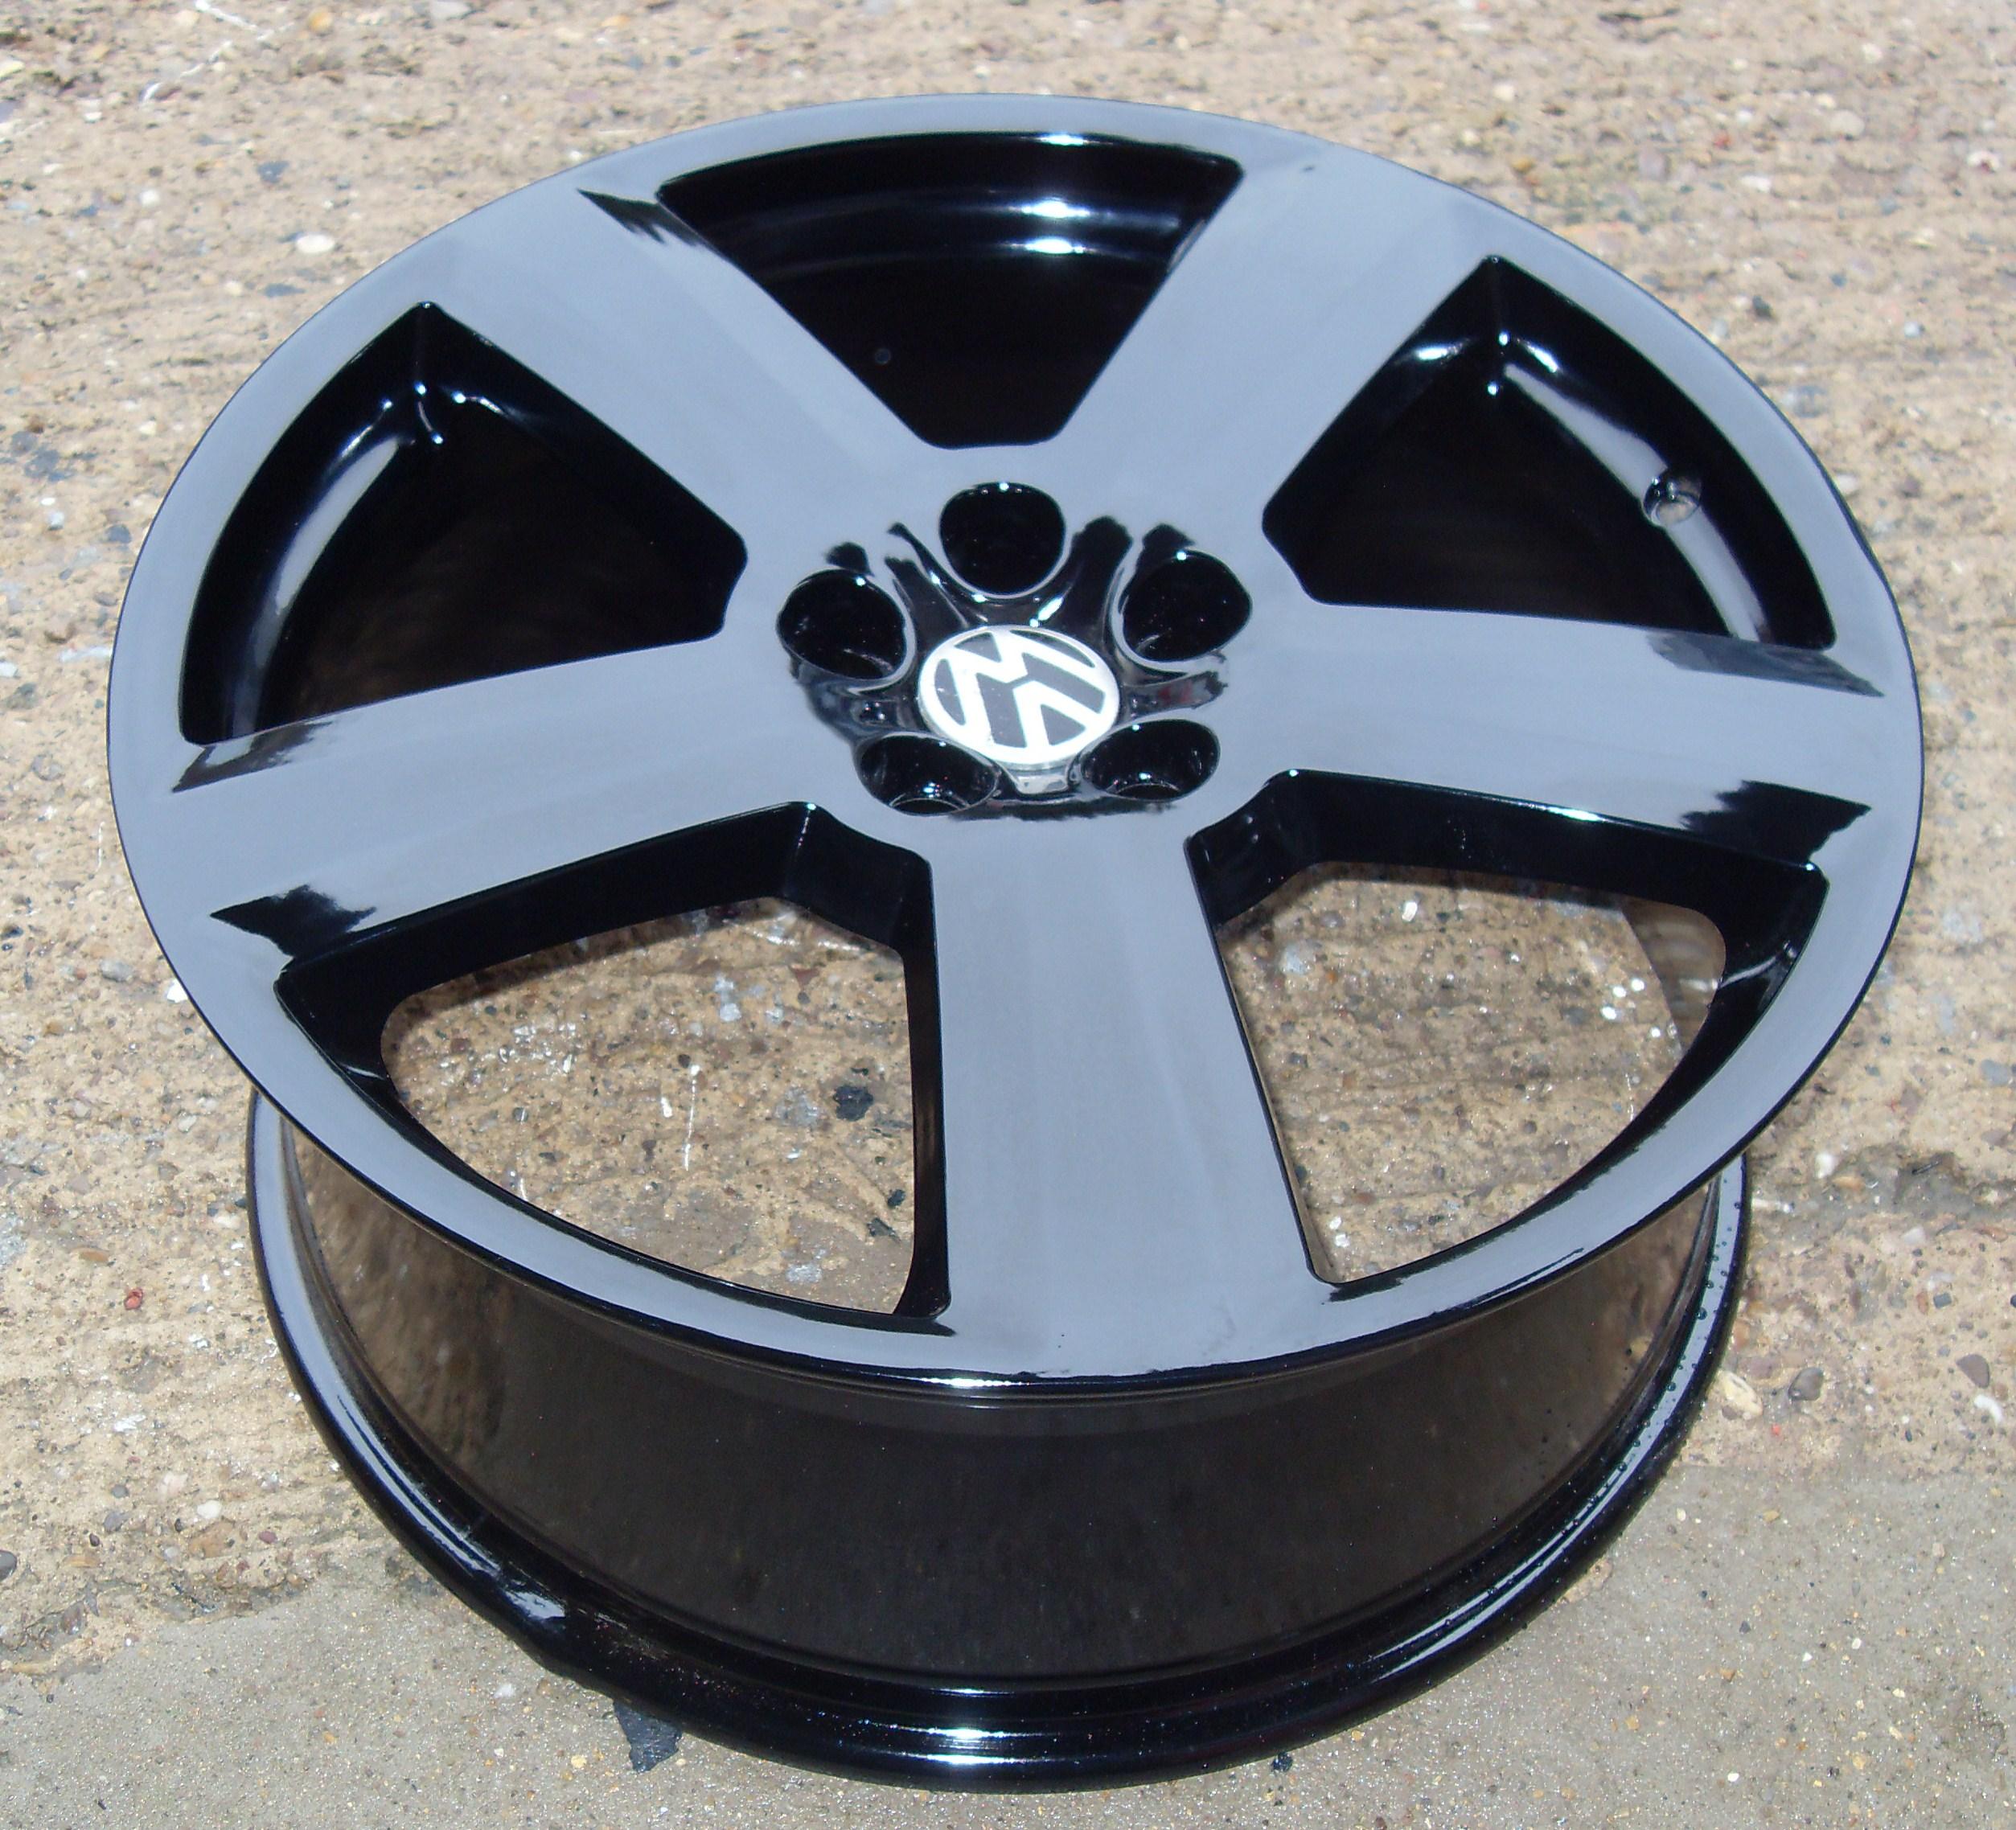 Audi RS6 replica wheels powder coated black for VW Passat ...